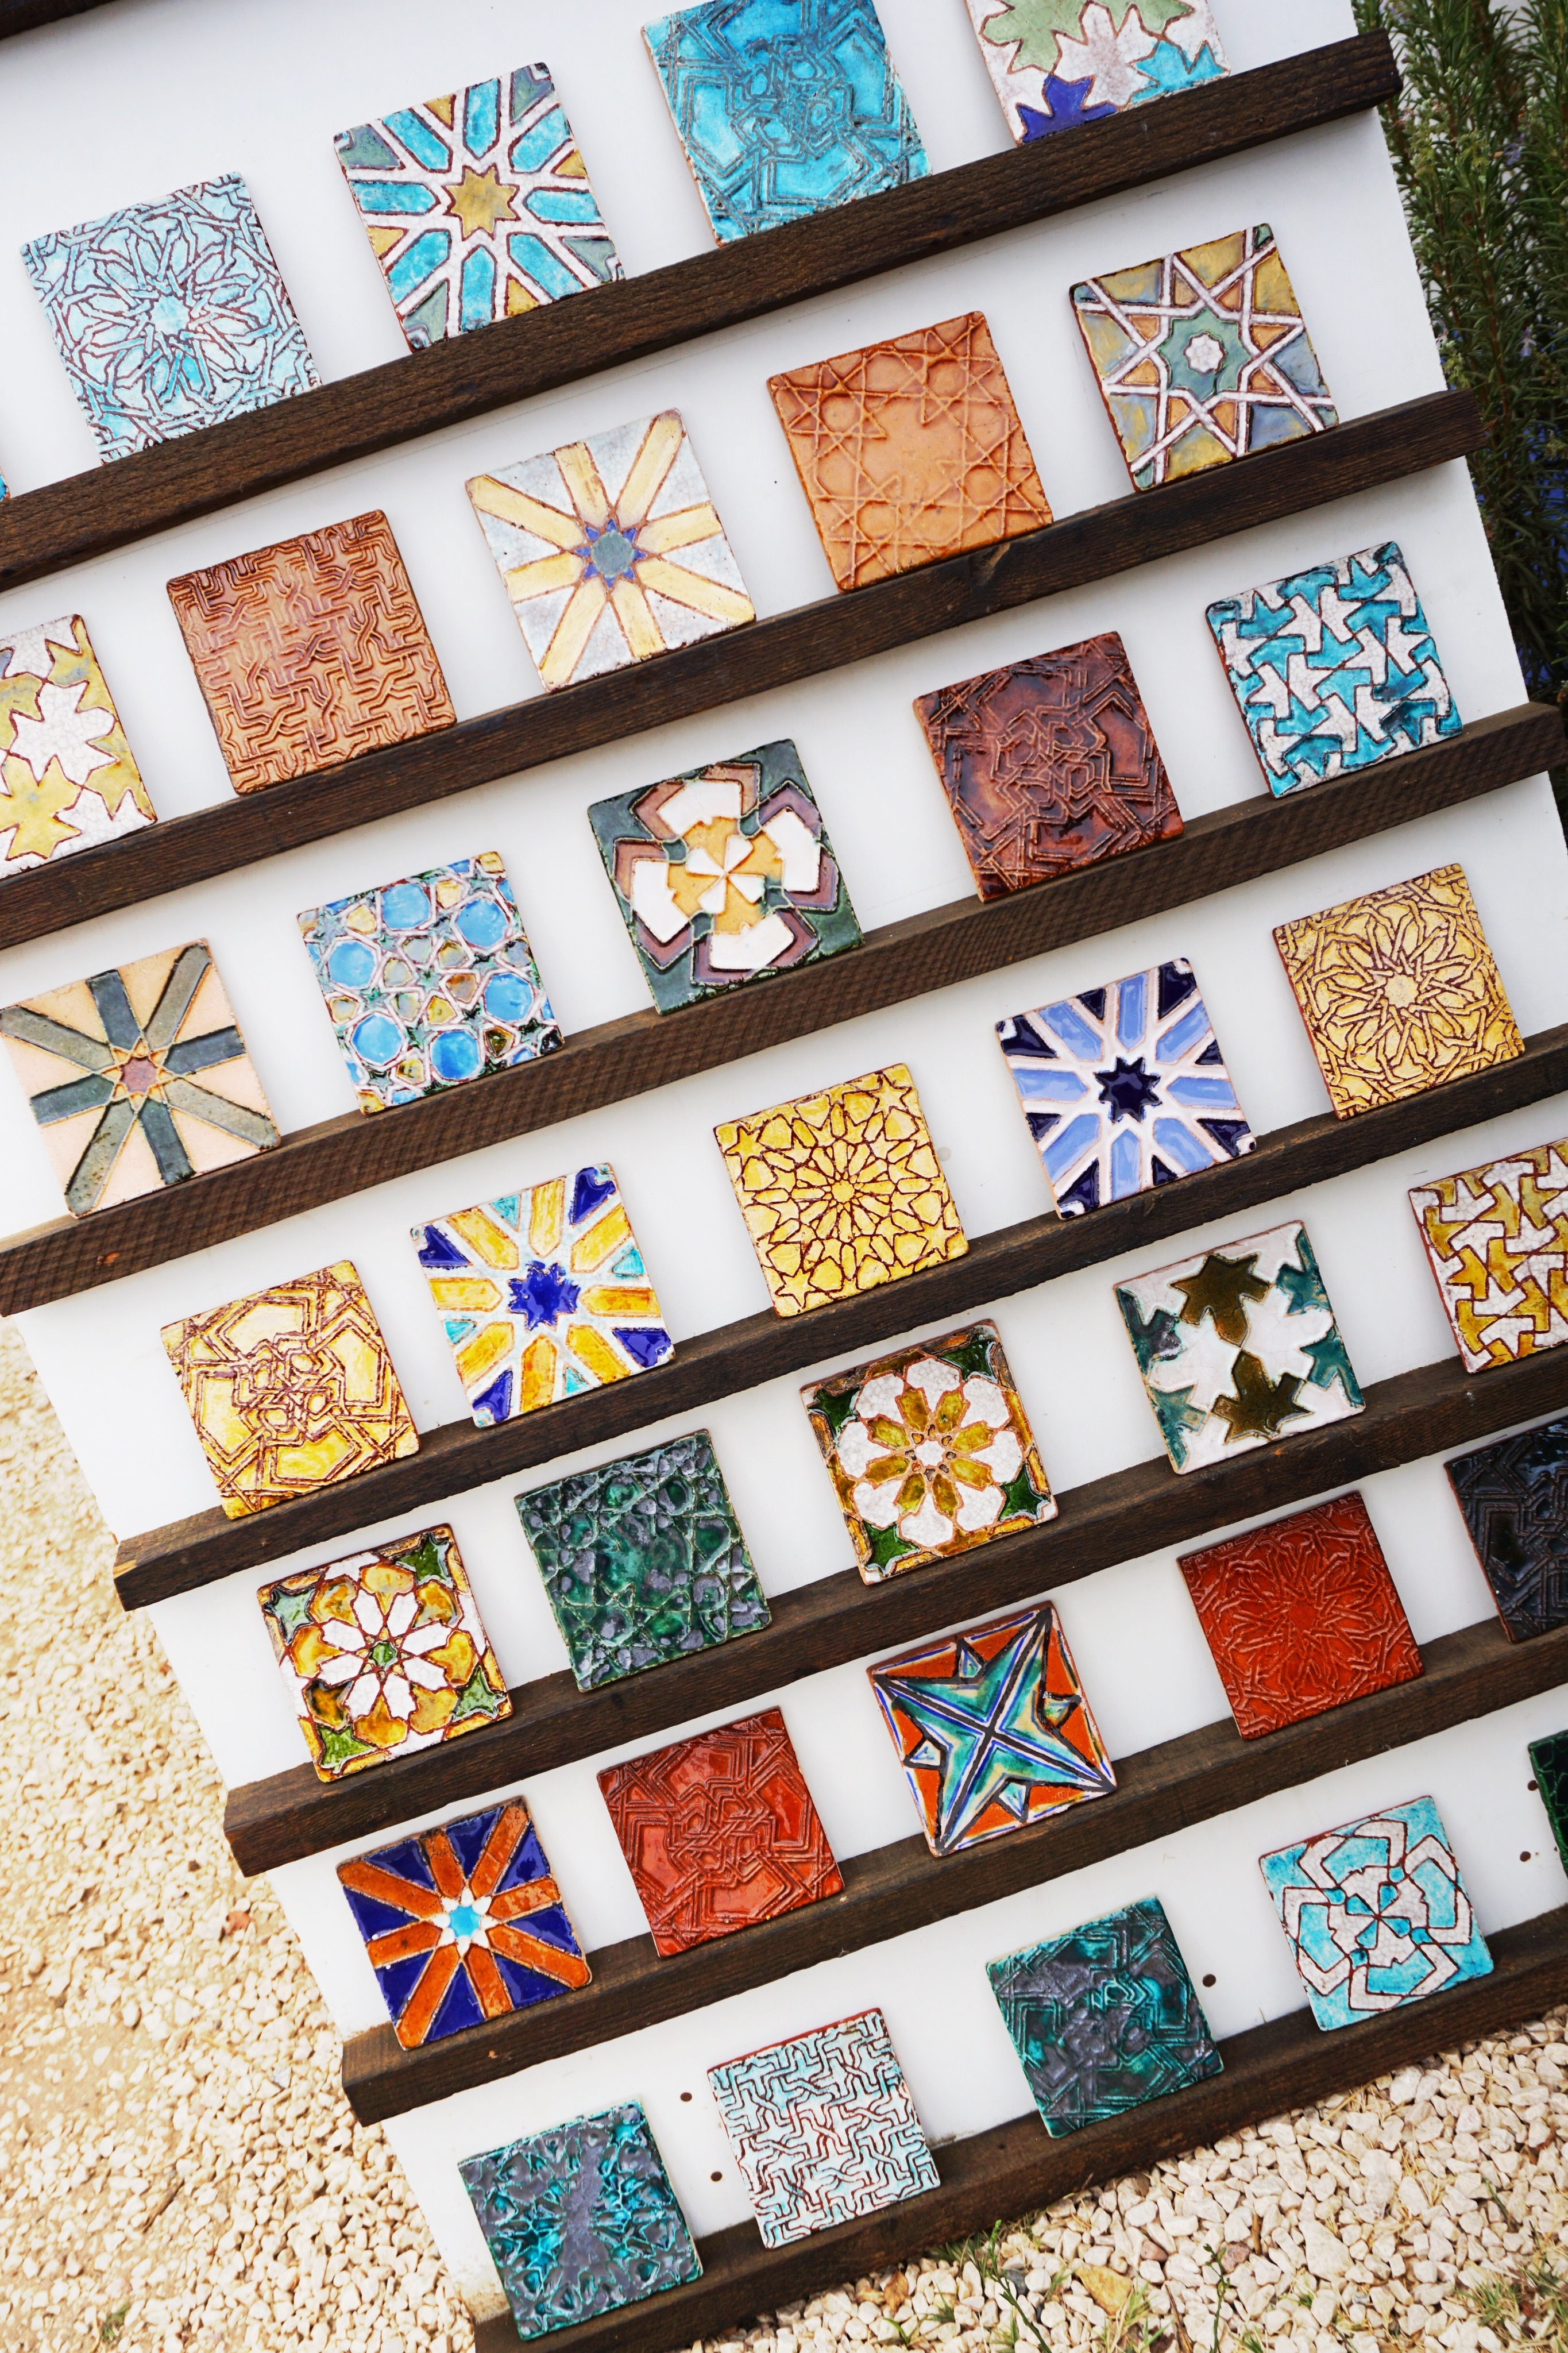 Azulejos in the Alentejo, Portugal